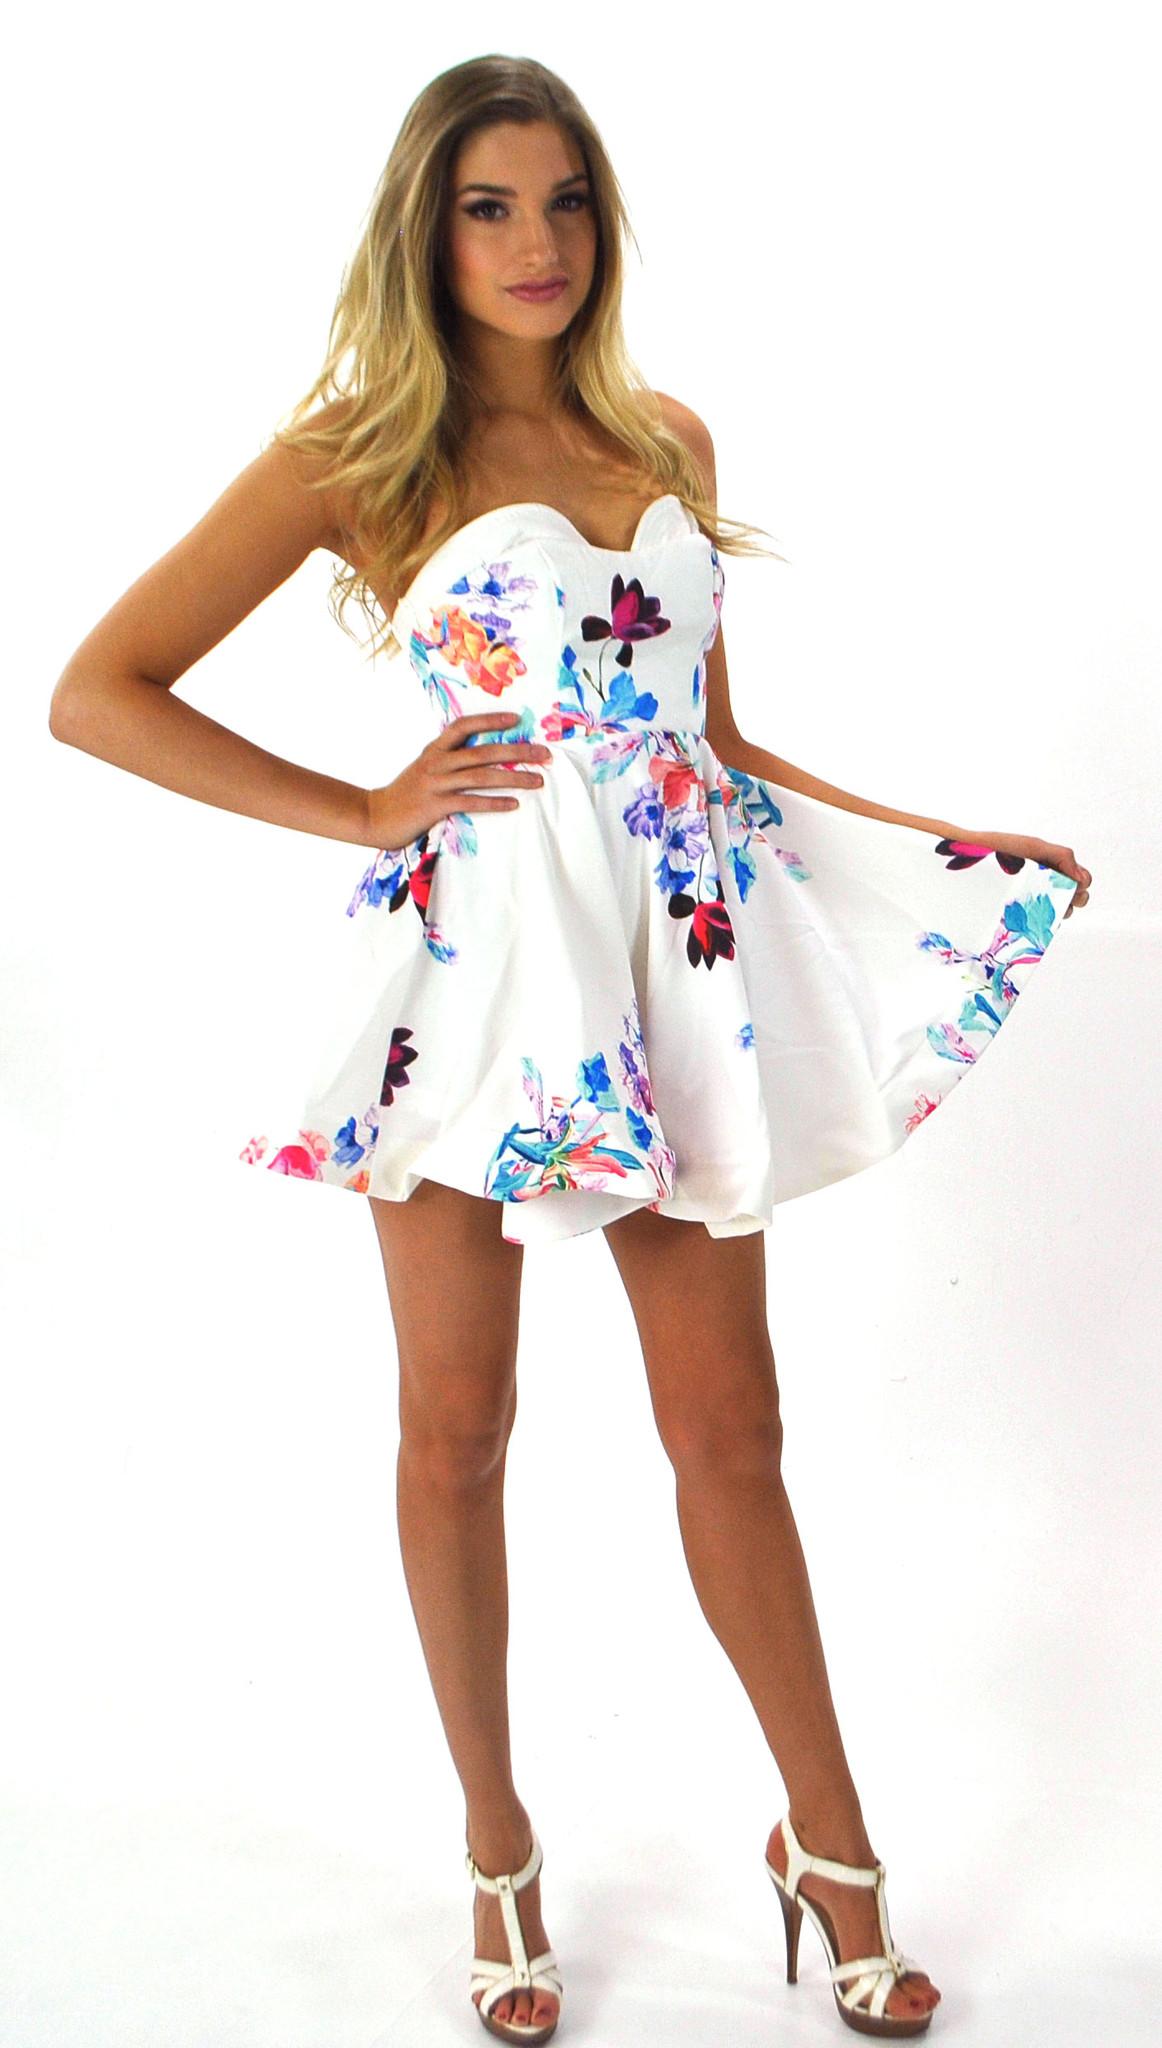 Light sabrina couture dress